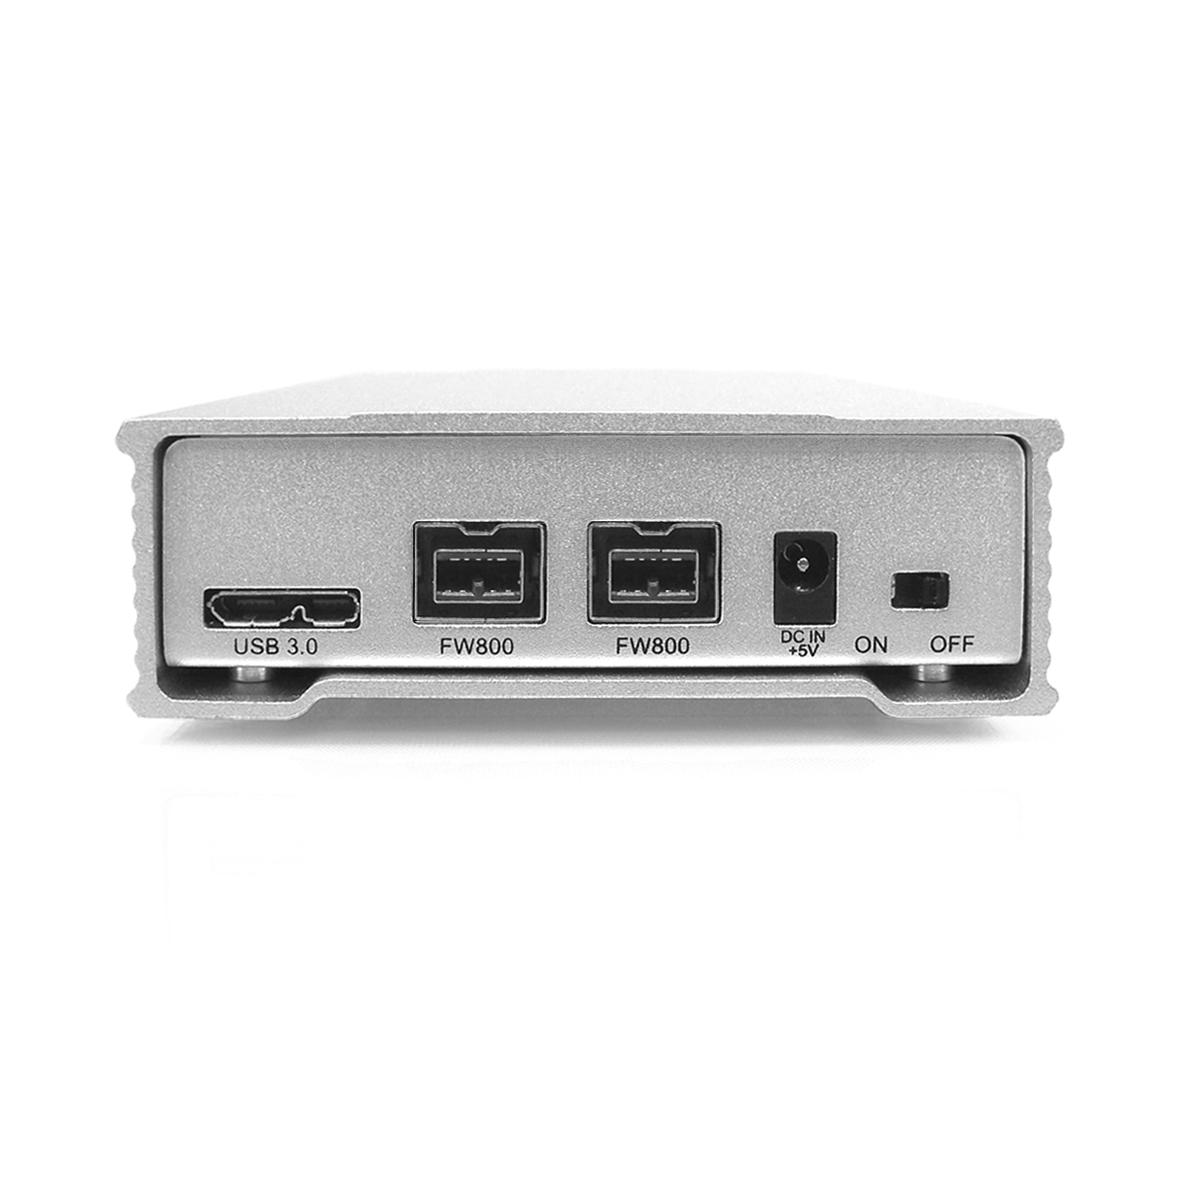 MiniPro FireWire 800, USB 3.0 Portable Hard Drive w/ Oxford Chipset